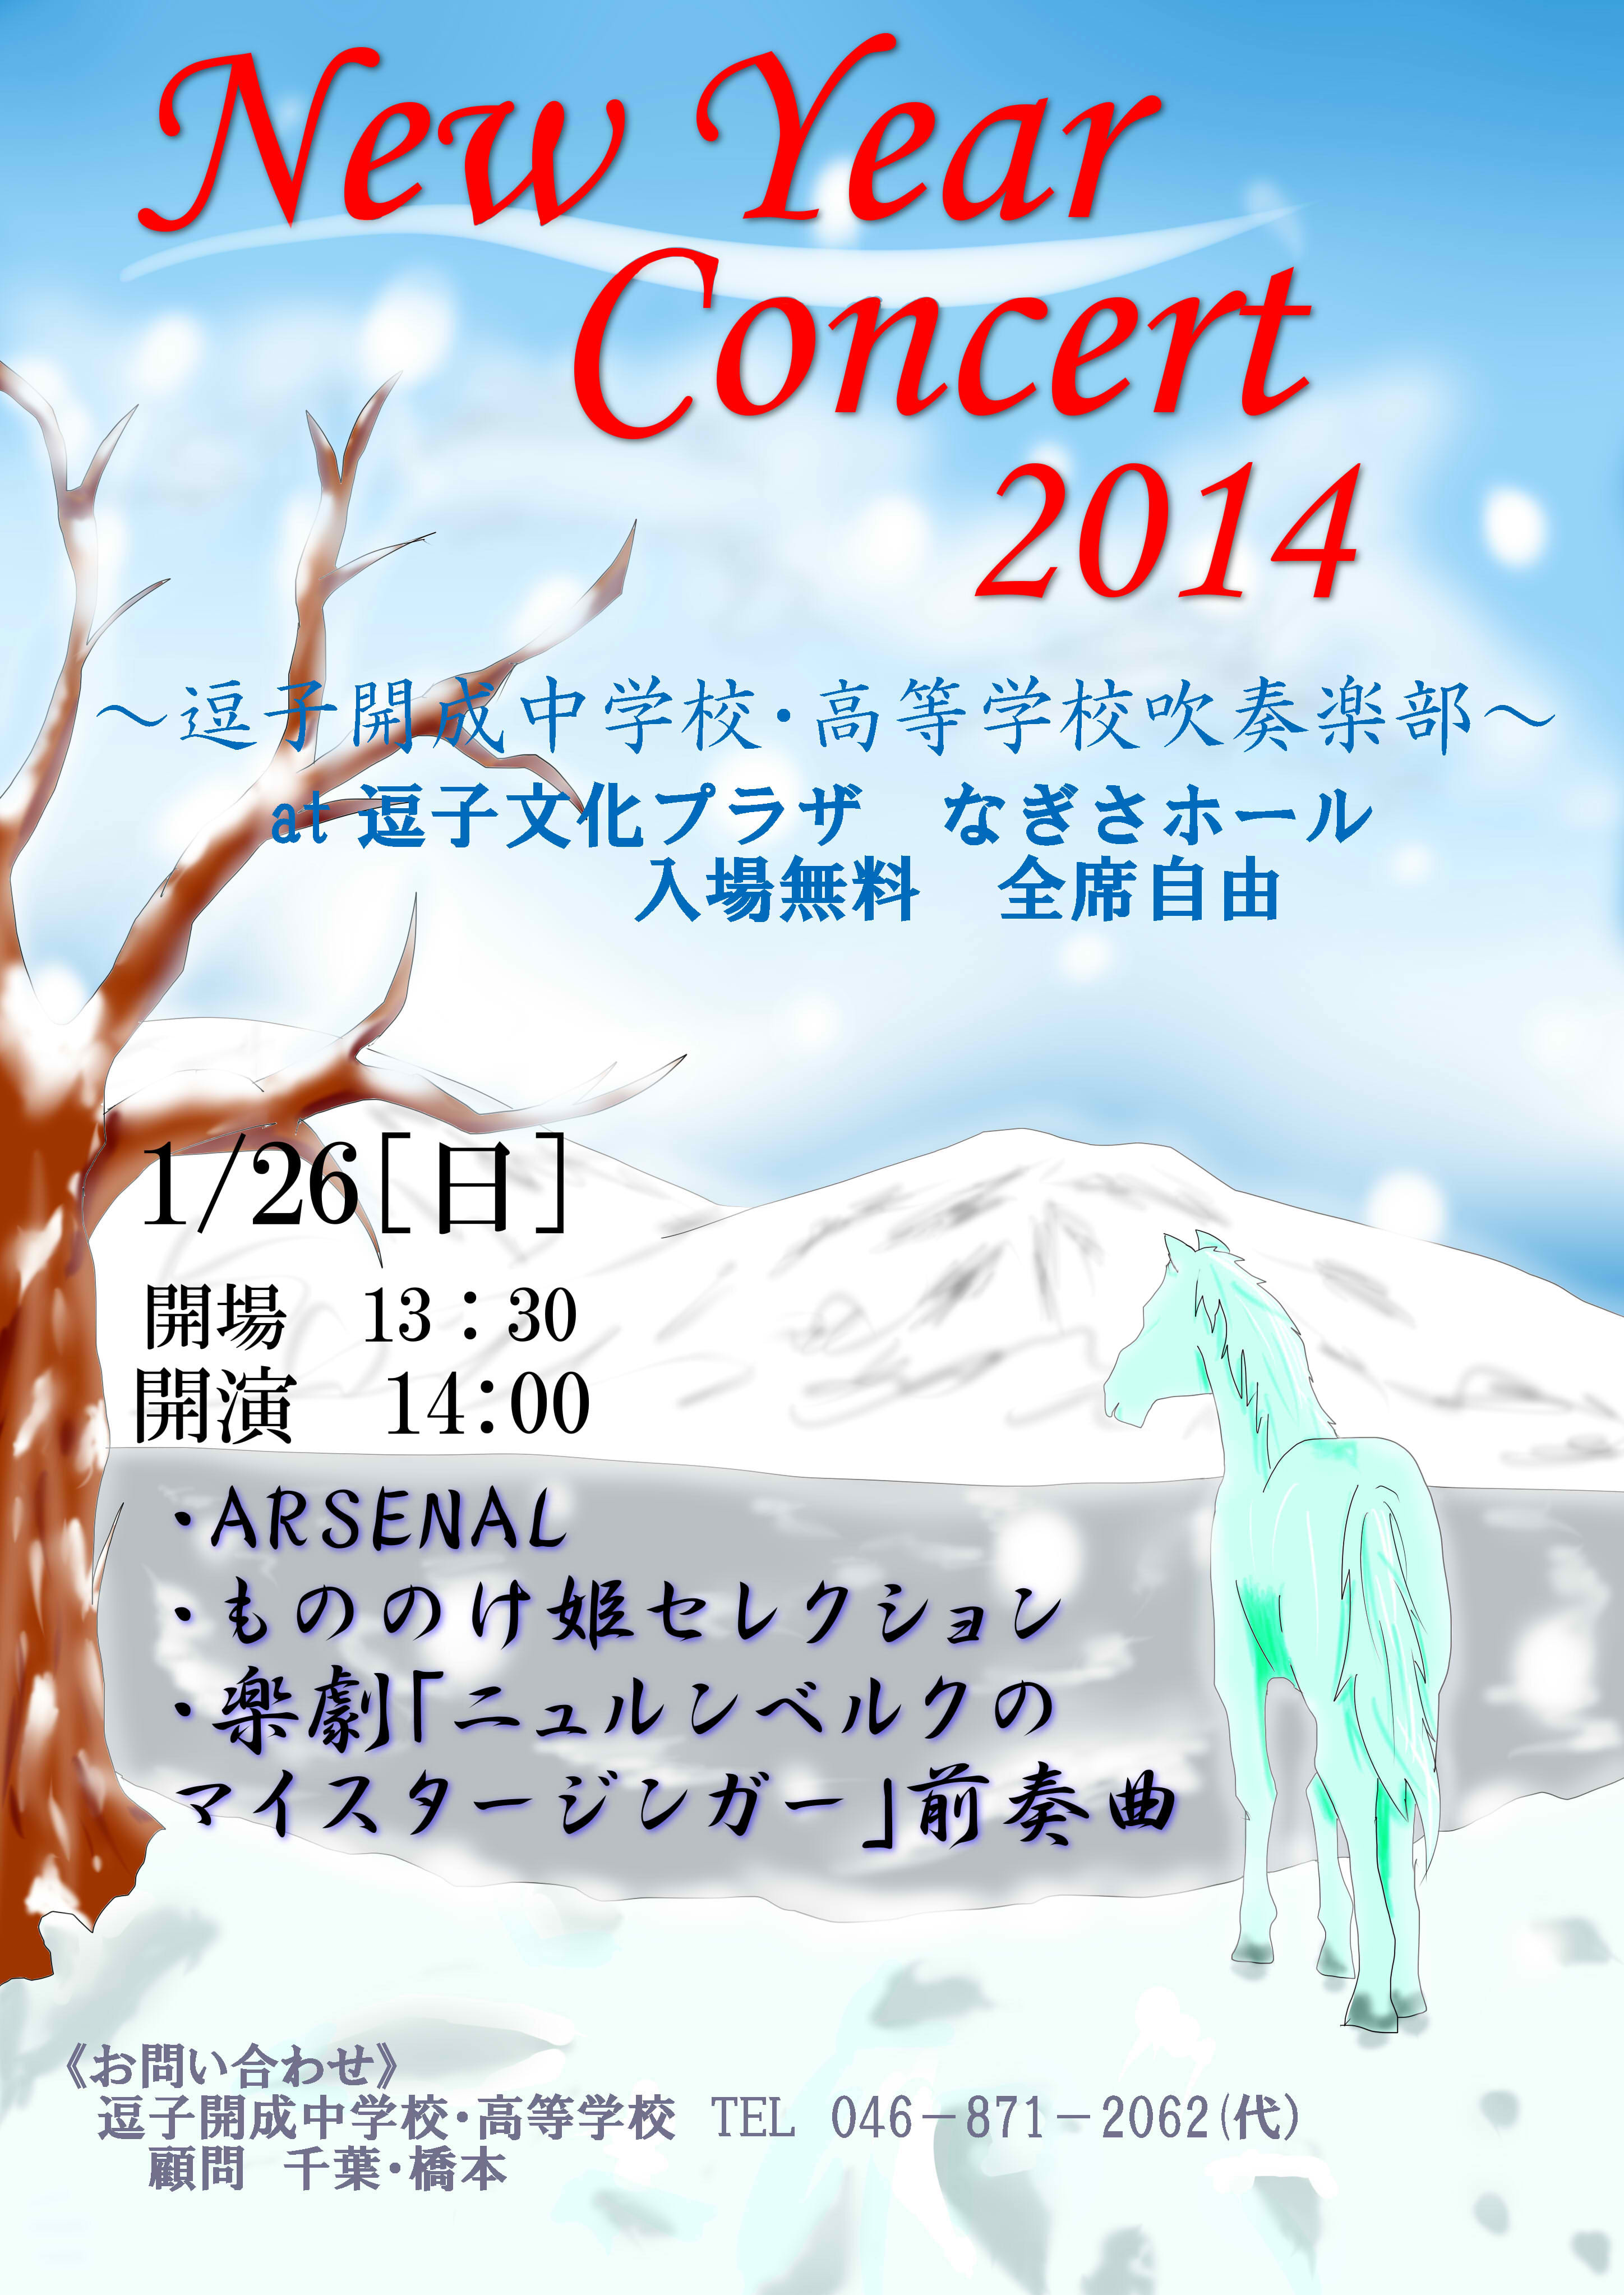 http://www.zushi-kaisei.ac.jp/news/newyearconcertposuta2.jpg